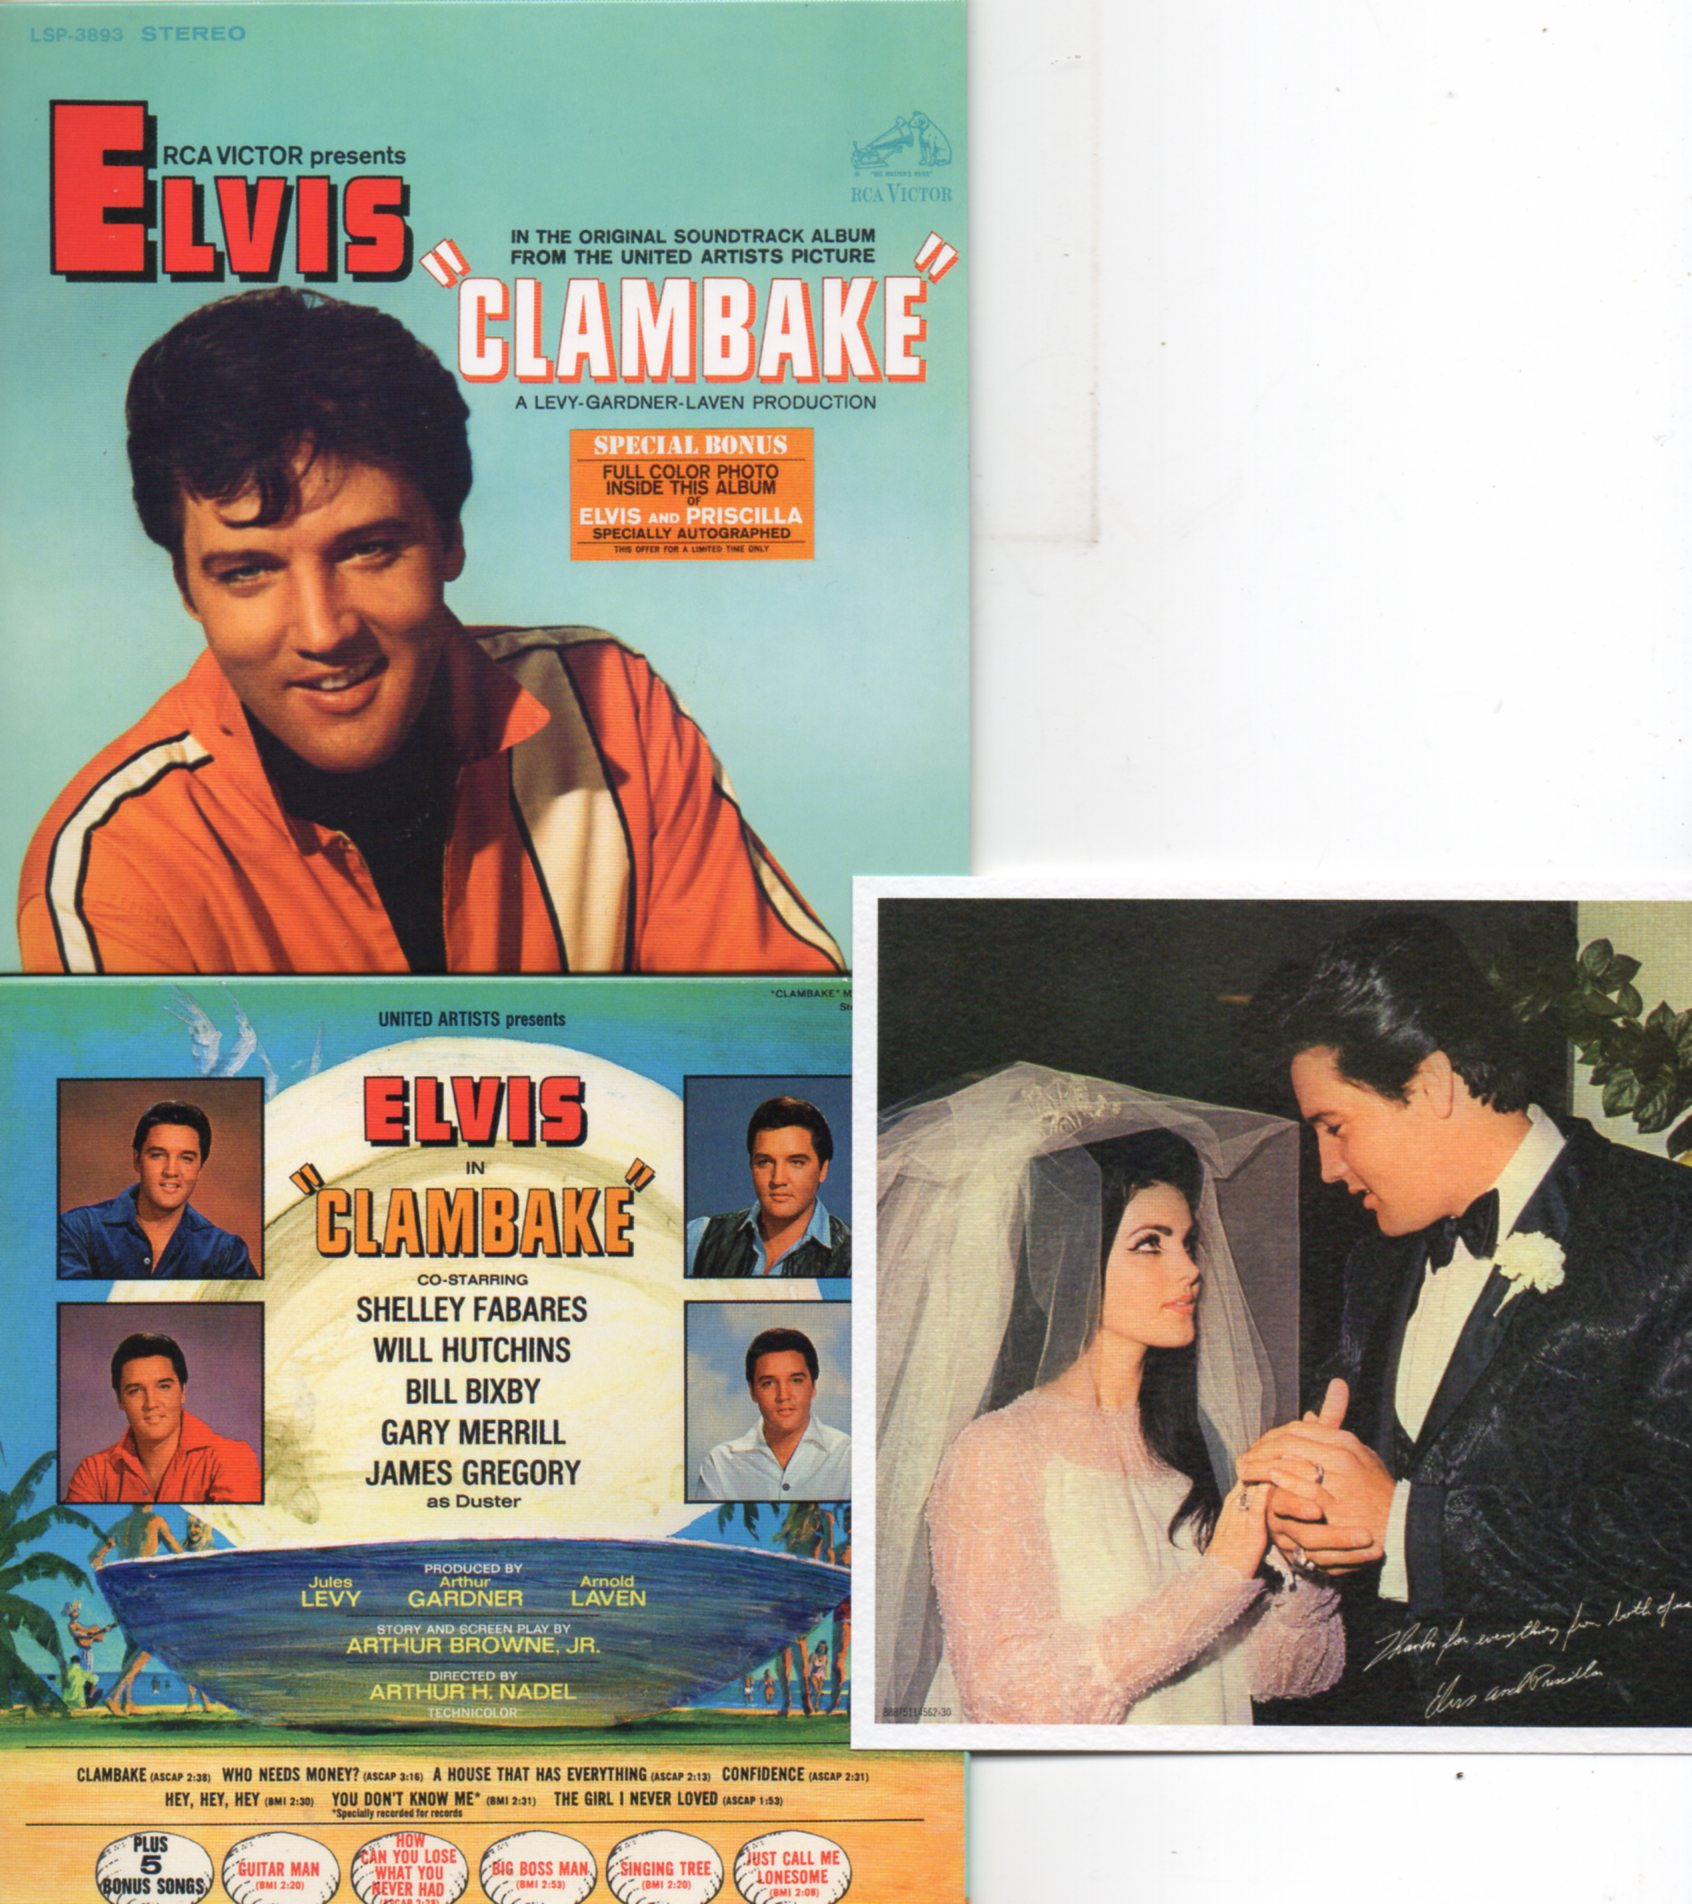 Elvis PRESLEY - Clambake (1967 - Mini Lp Replica - 13-track Card Sleeve Including Card)